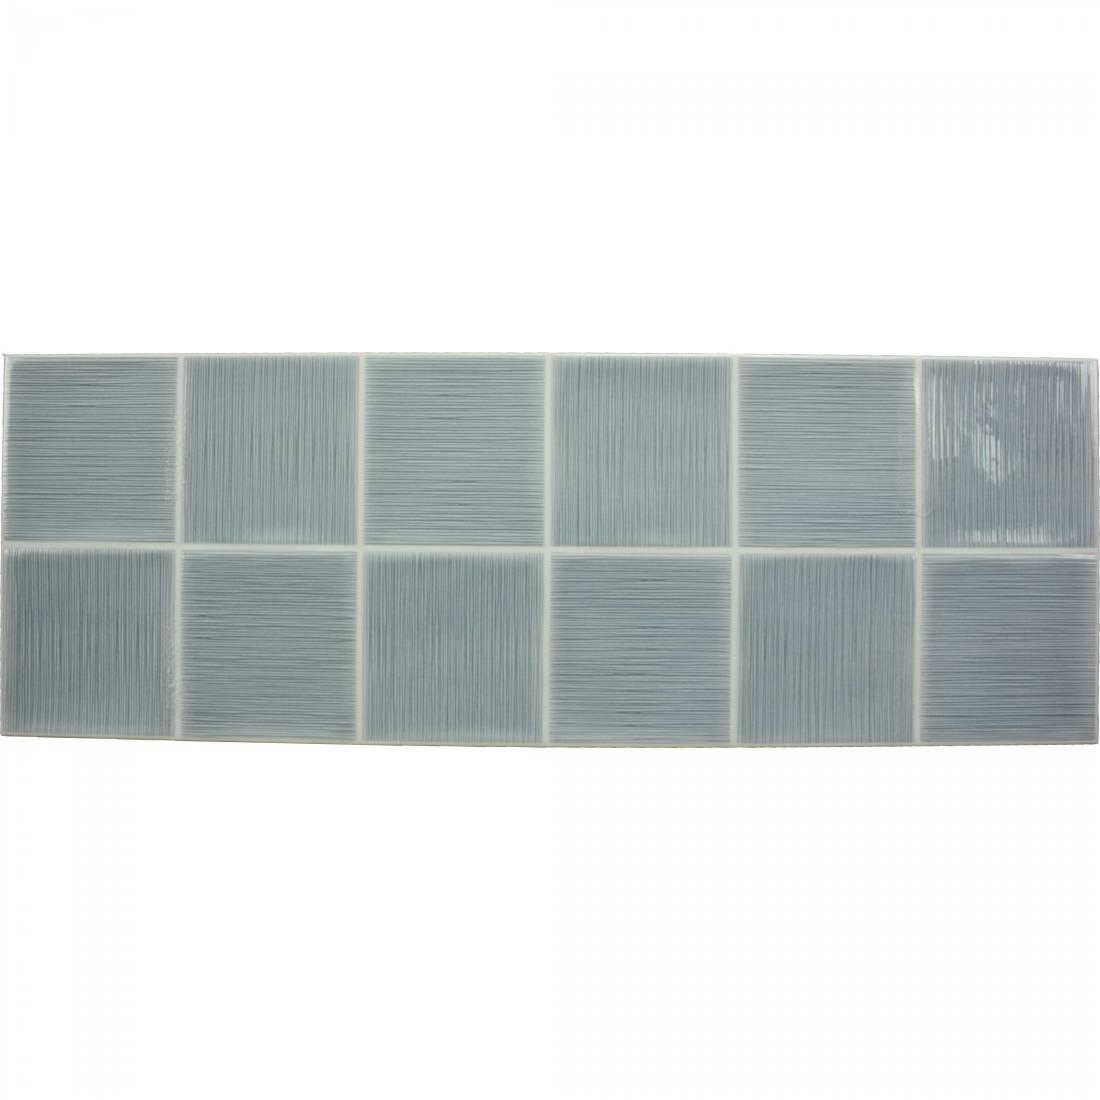 Arlette Decor 21.4x61 Aqua Gloss 1